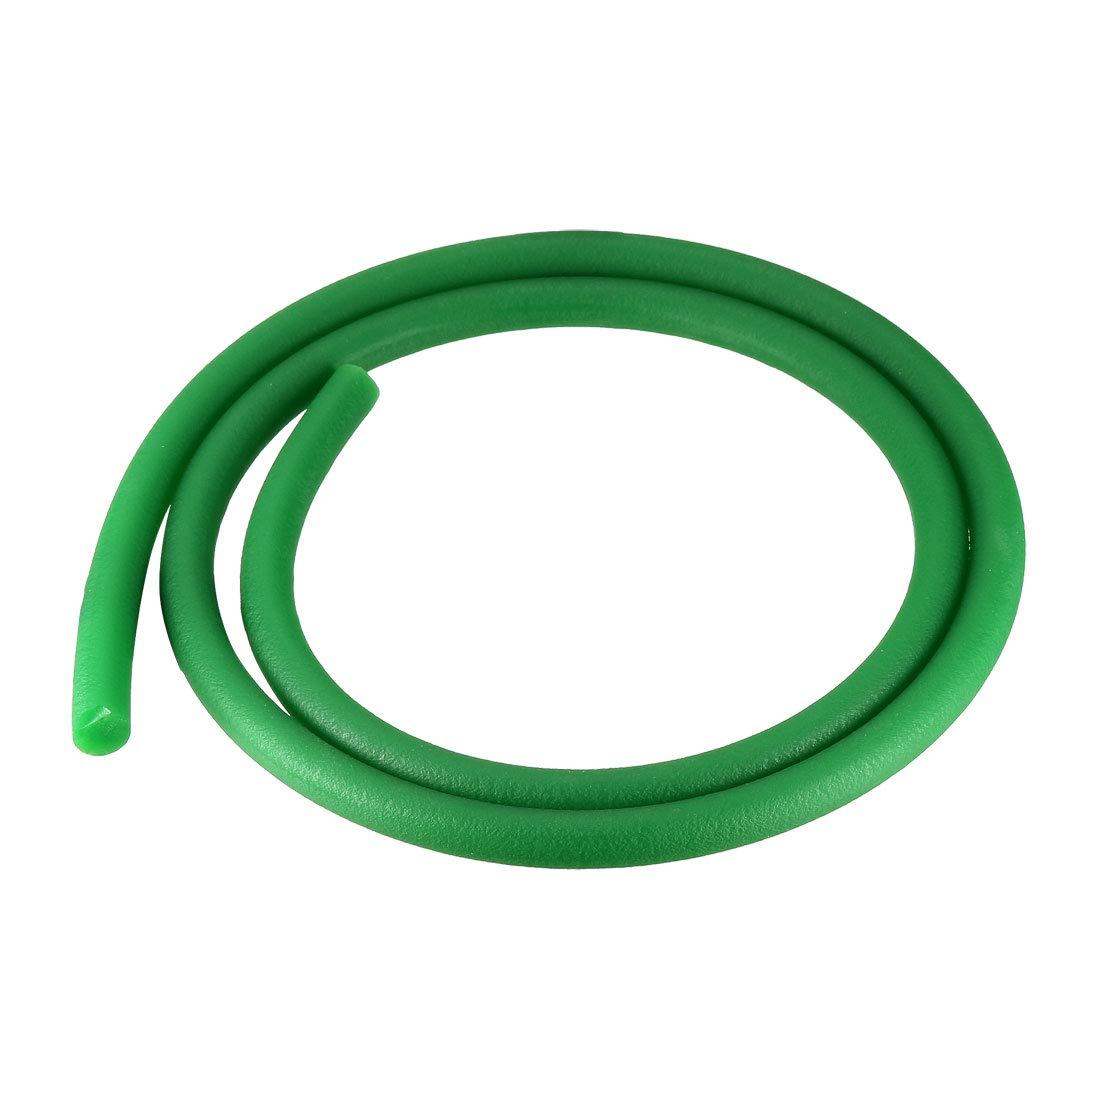 uxcell 3ft 7mm PU Transmission Round Belt High-Performance Urethane Belting Green for Conveyor Bonding Machine Dryer